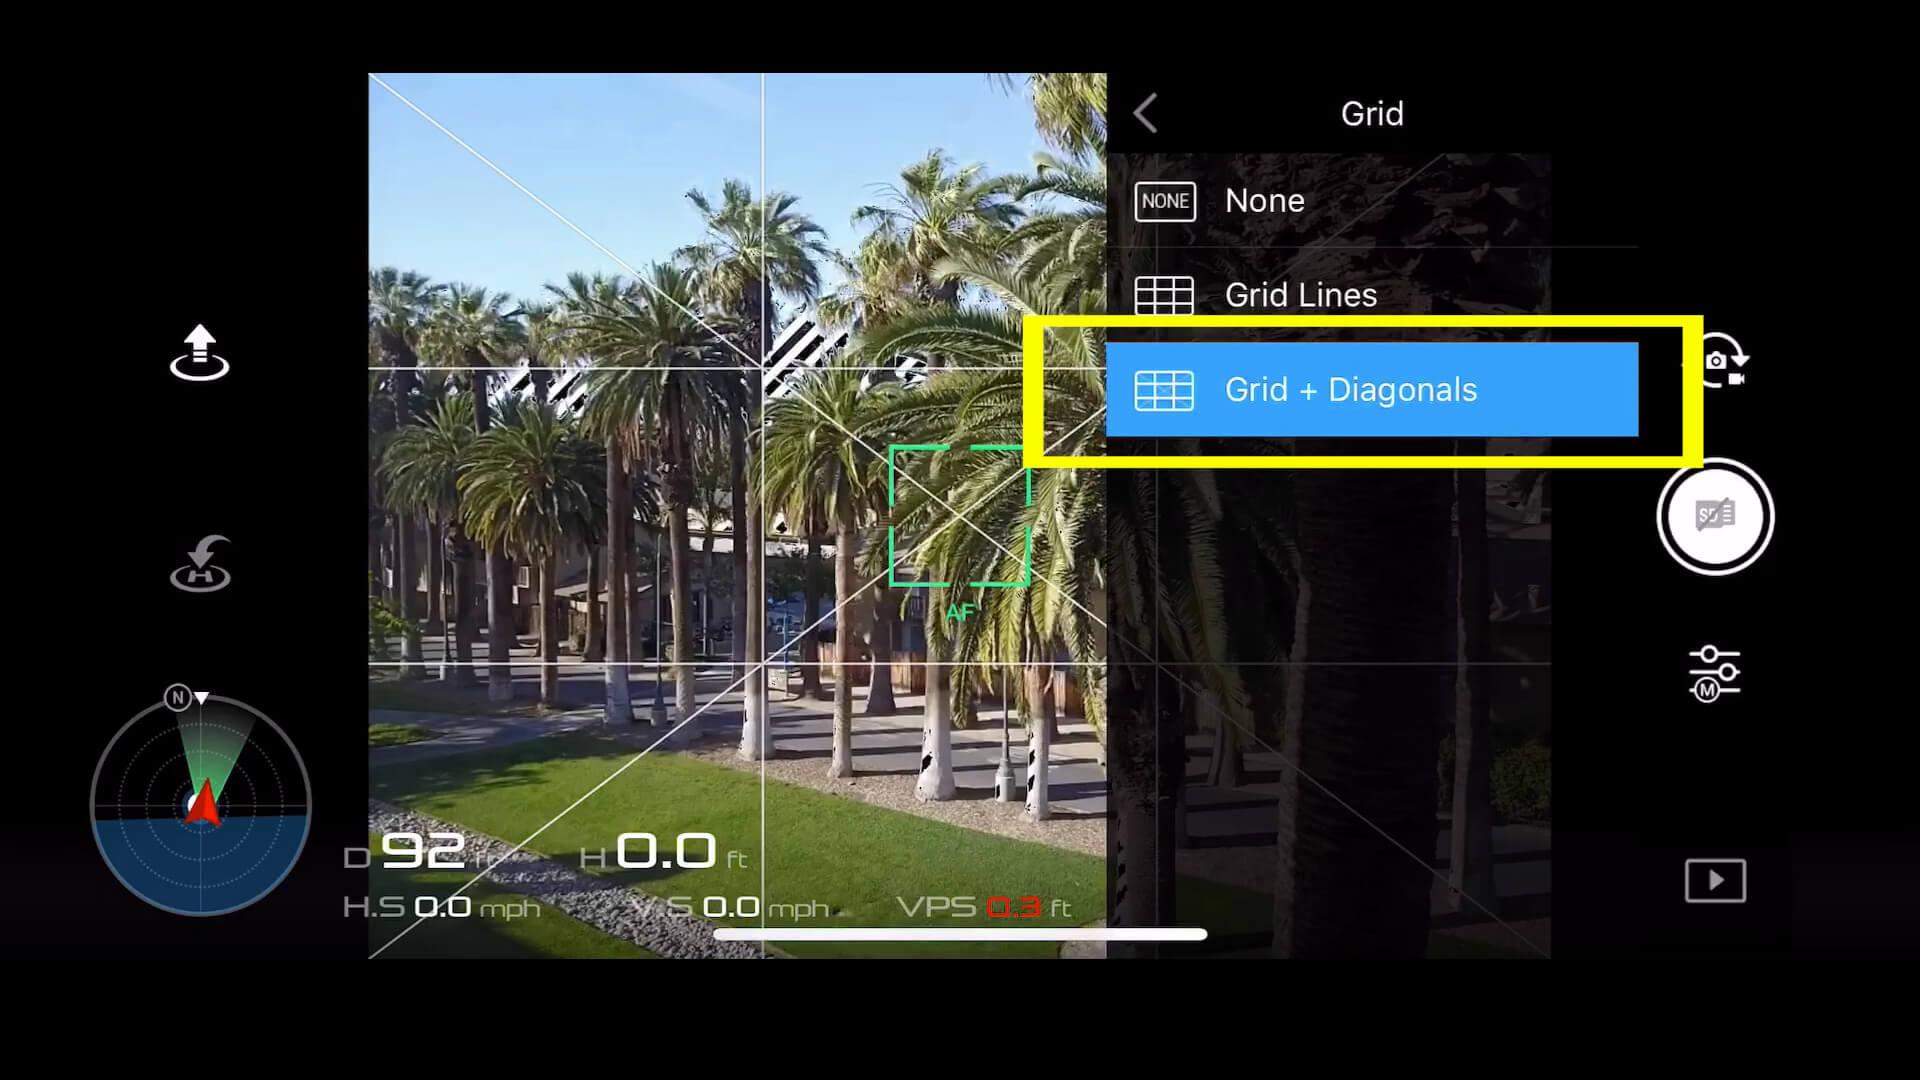 13 basic camera settings for dji drone photos - grid